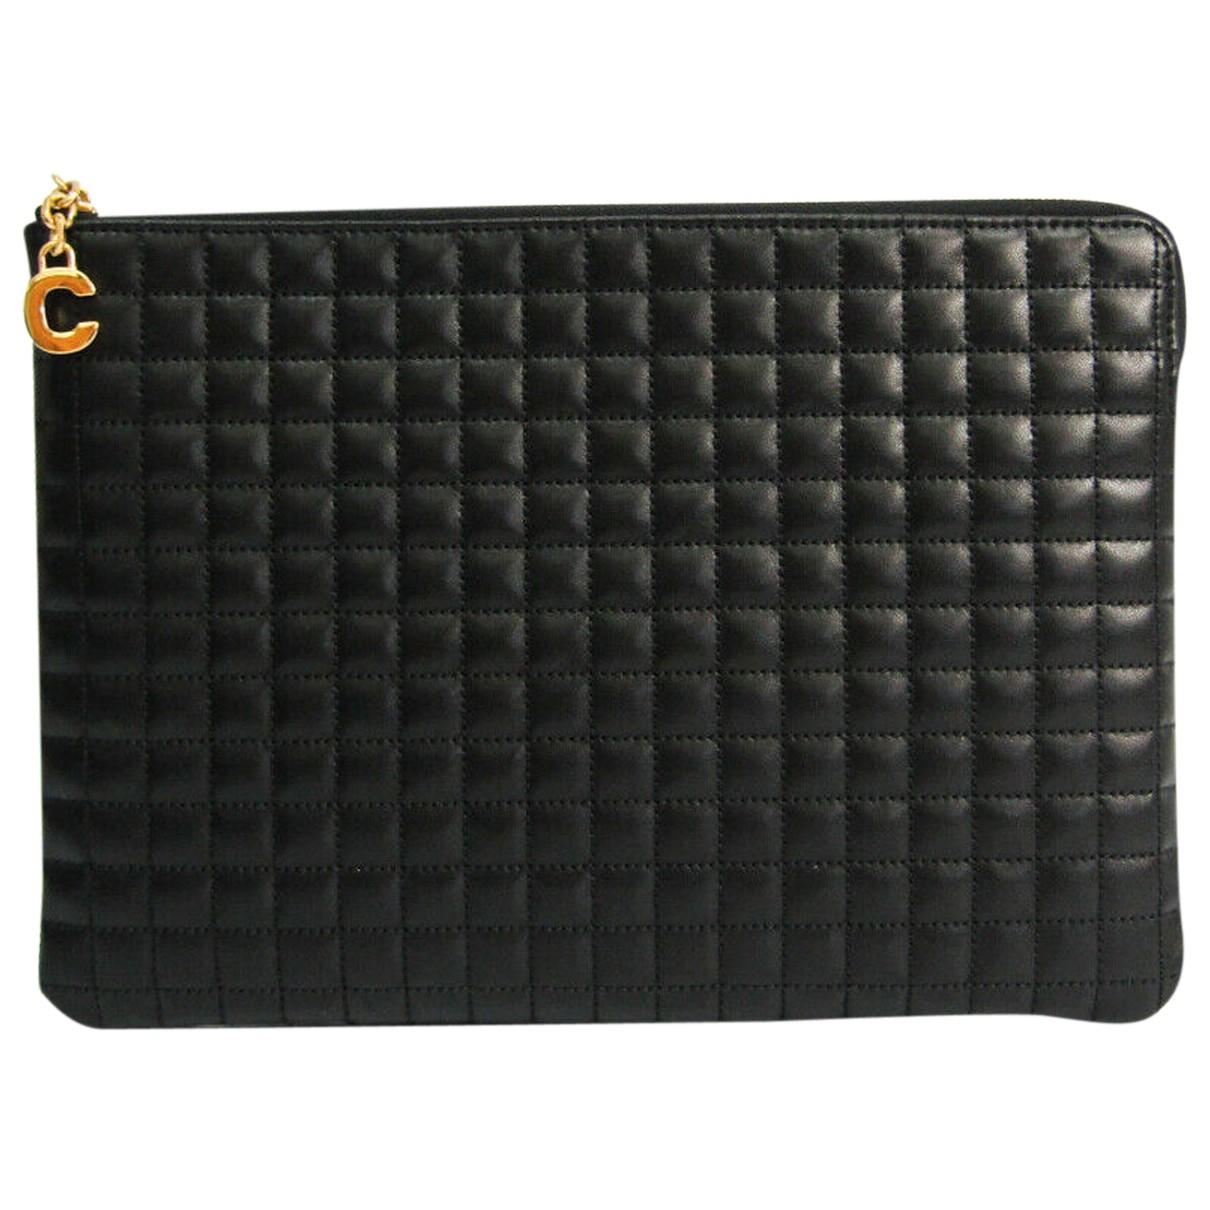 Celine C charm Black Leather Clutch bag for Women N